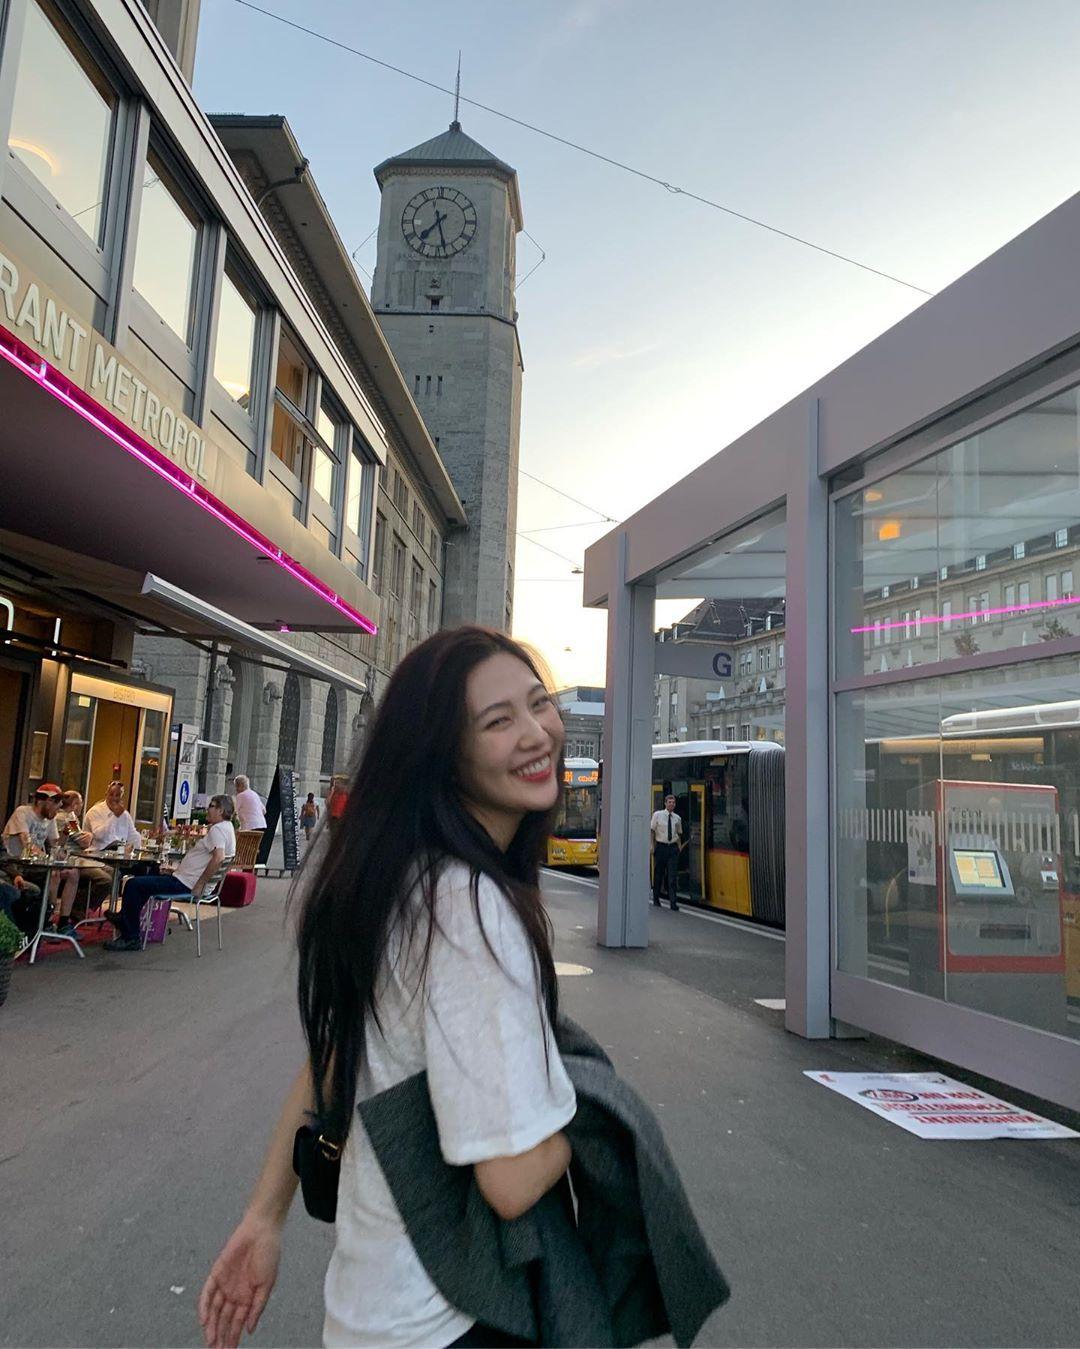 [Red Velvet][分享]190917 RedVelvet Joy,在瑞士也散发的女友般清新魅力